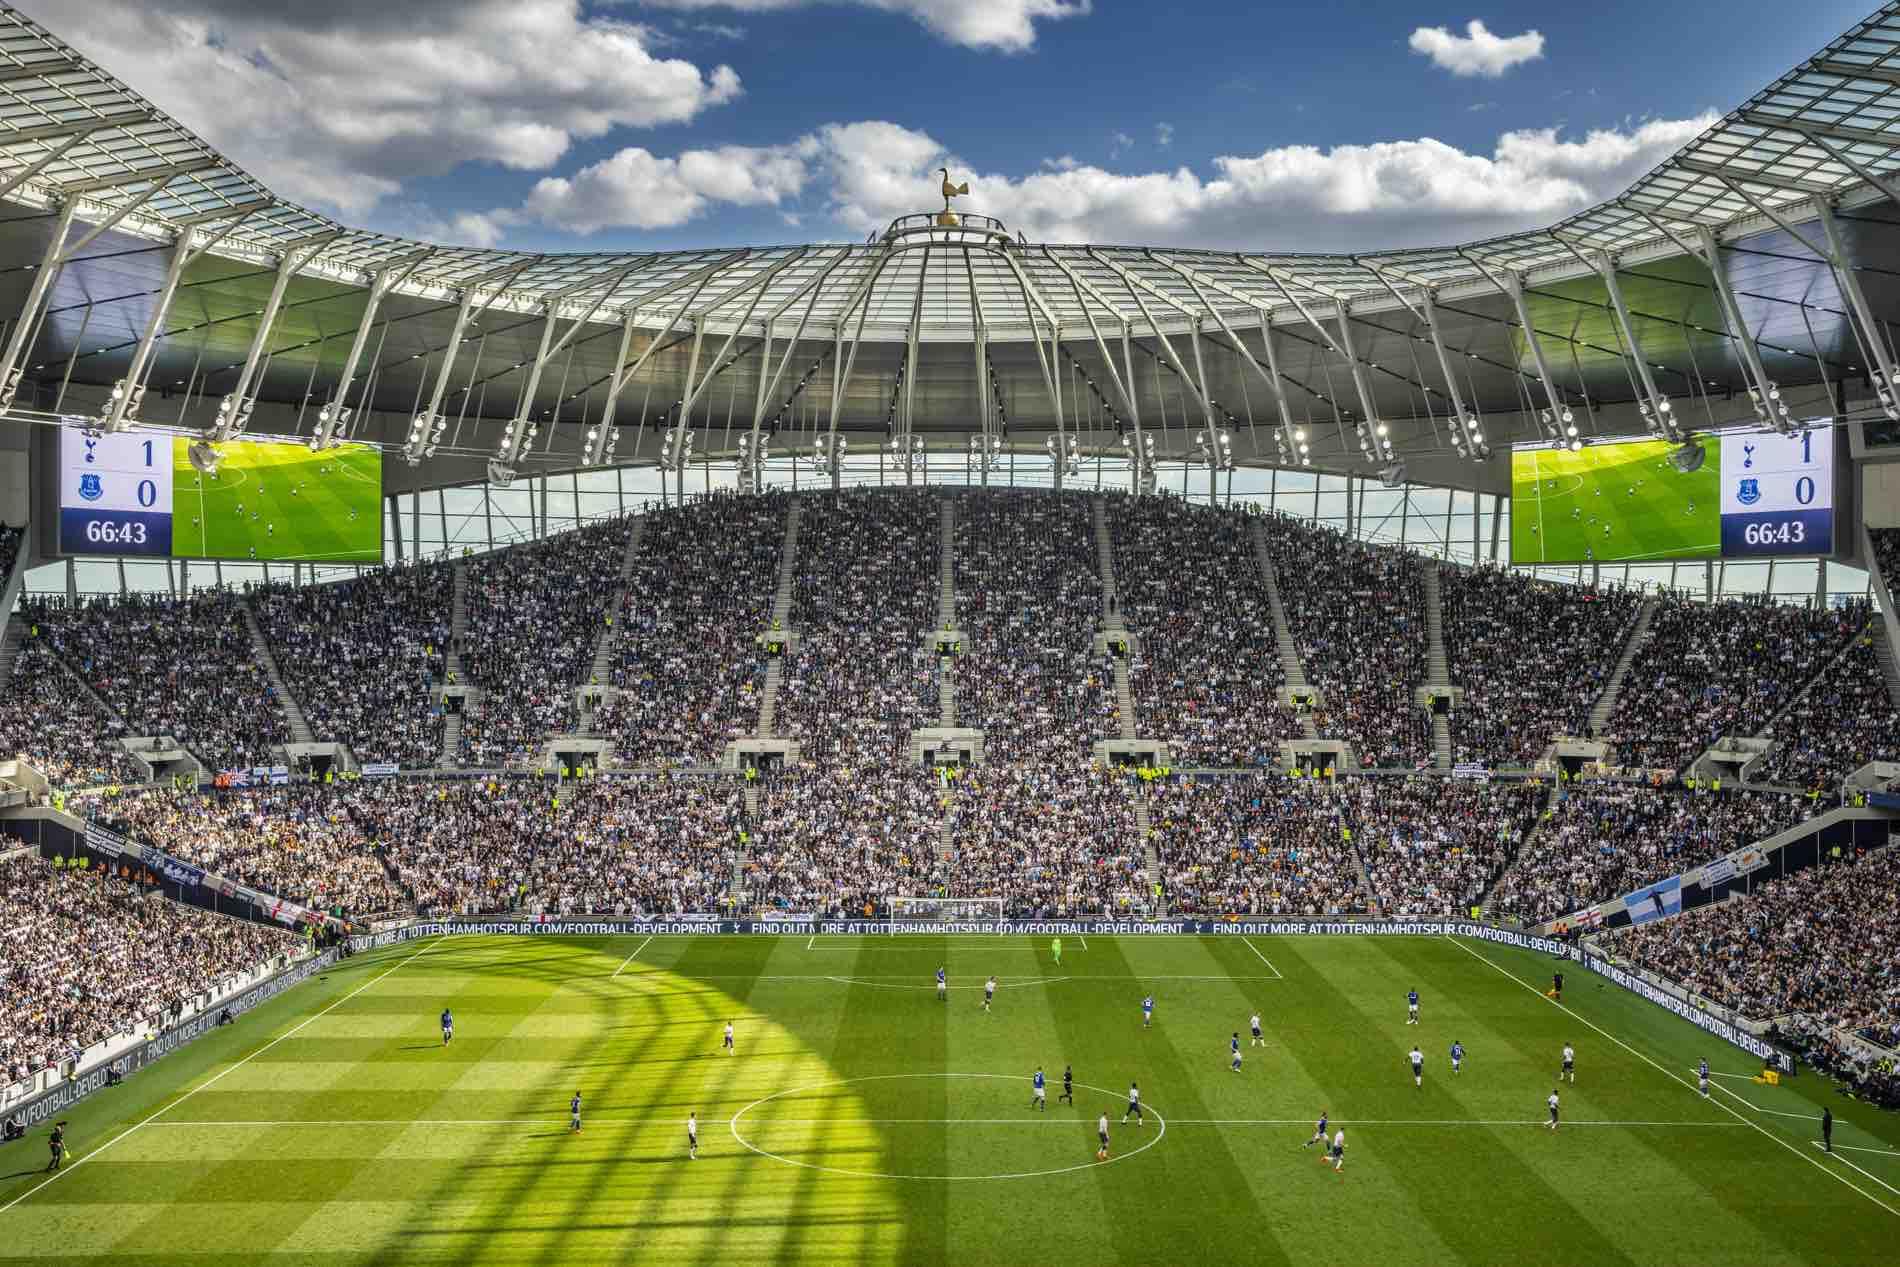 Tottenham Hotspur; New Stadium, Match and Tours - King Goya